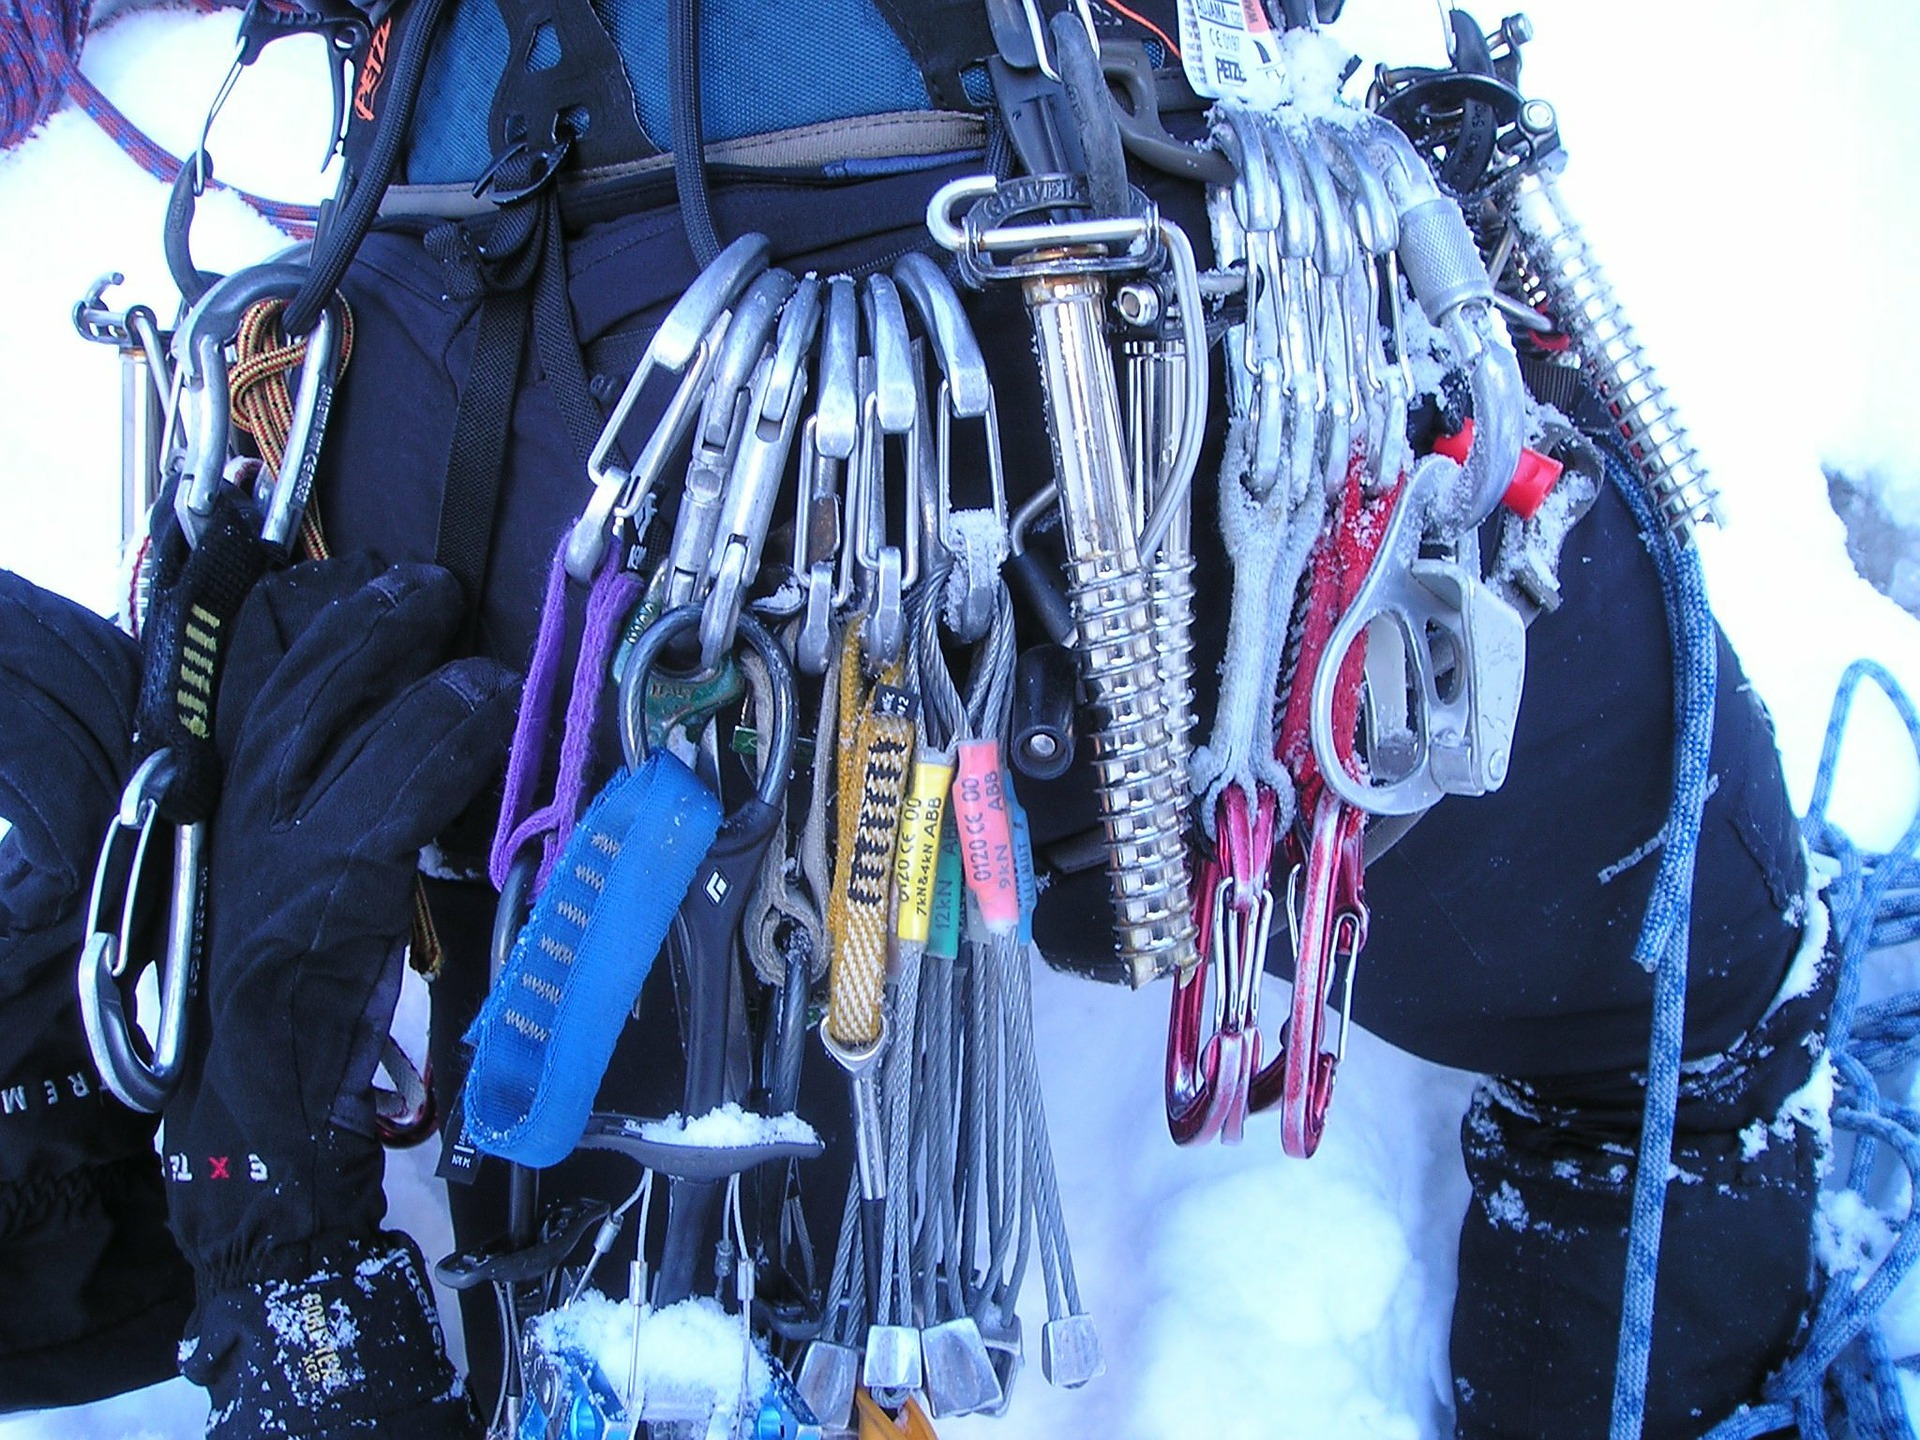 2 Furnace Industries Ice mixed climbing training gear.jpg